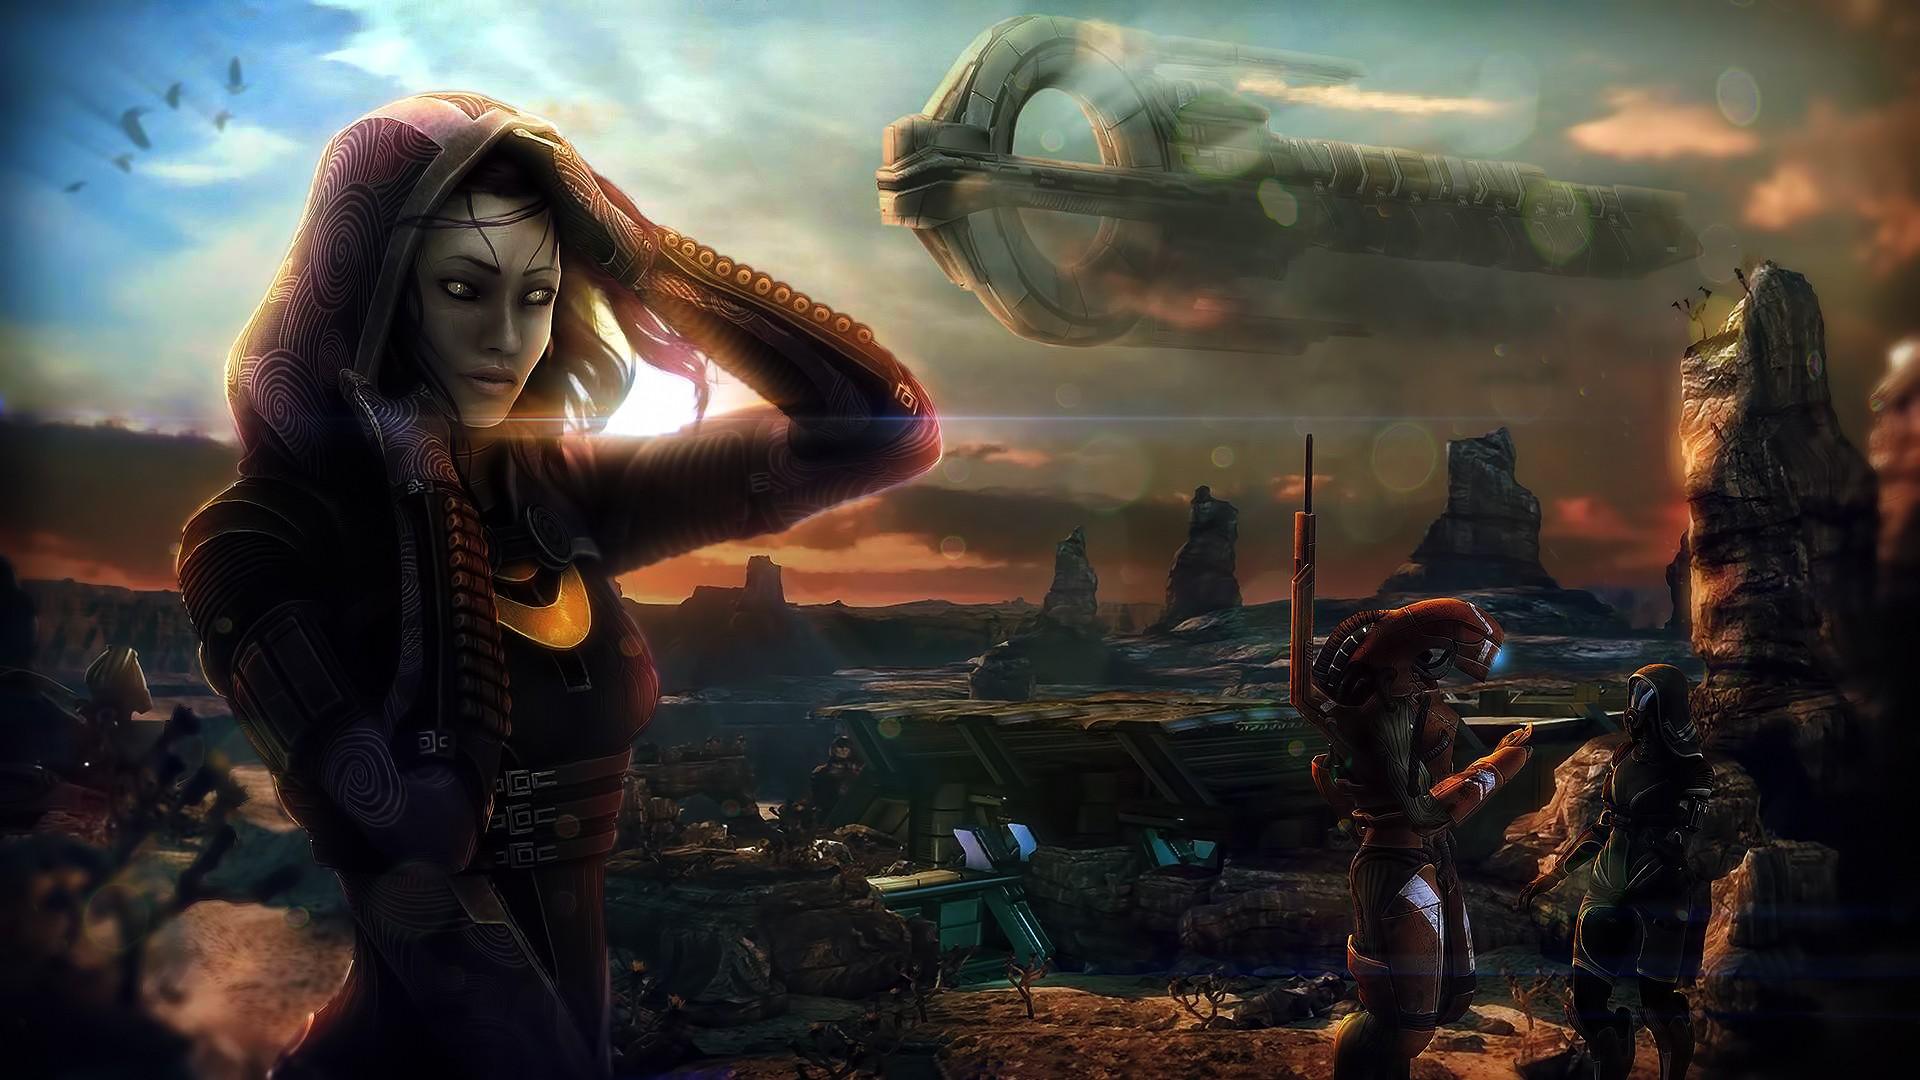 Wallpaper Video Games Mass Effect 3 Mythology Midnight Geth Darkness Screenshot Computer Wallpaper Special Effects Pc Game 1920x1080 Sergiucoj 90673 Hd Wallpapers Wallhere